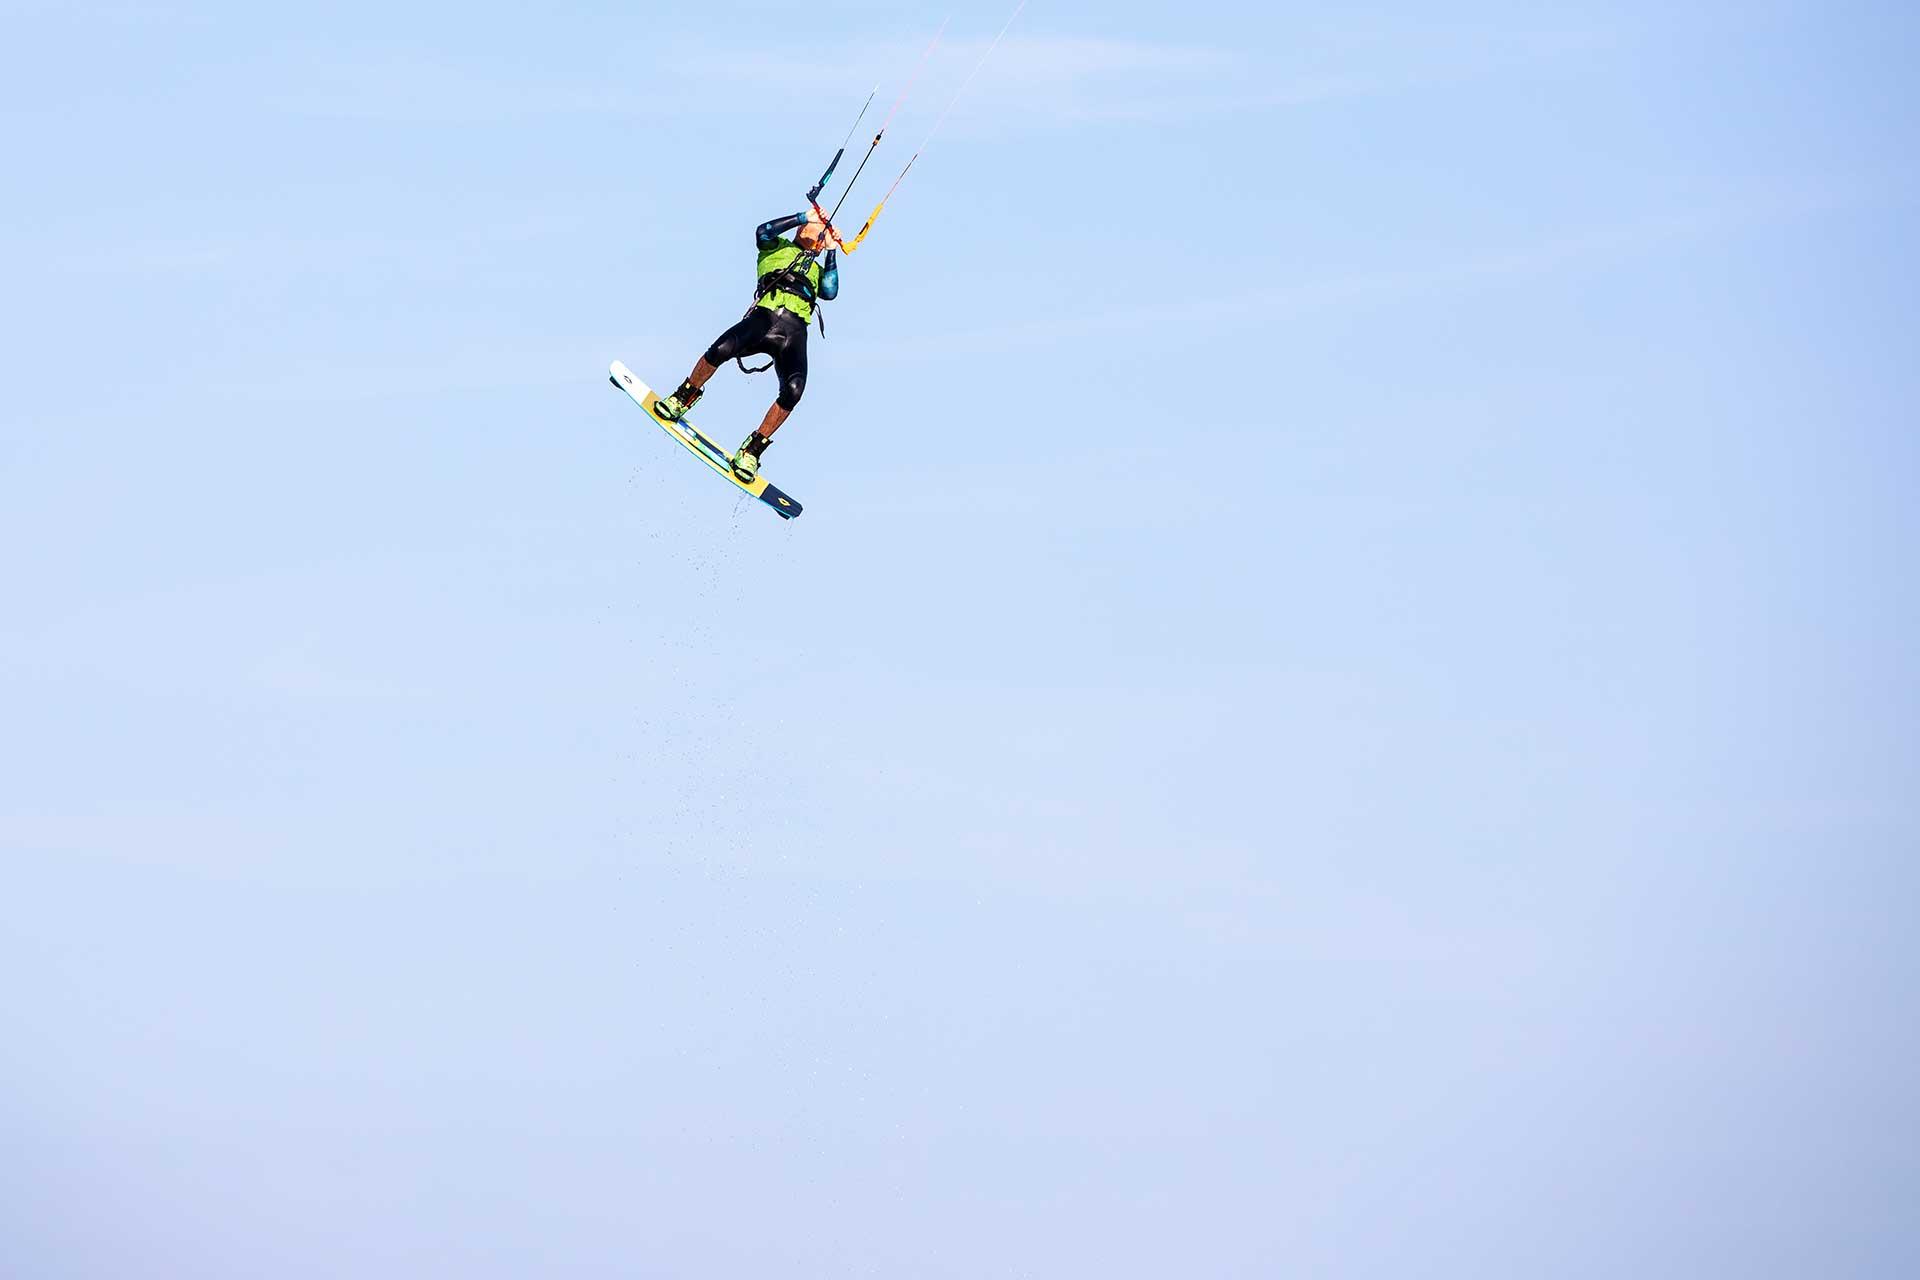 Lezioni Kitesurf Big Air